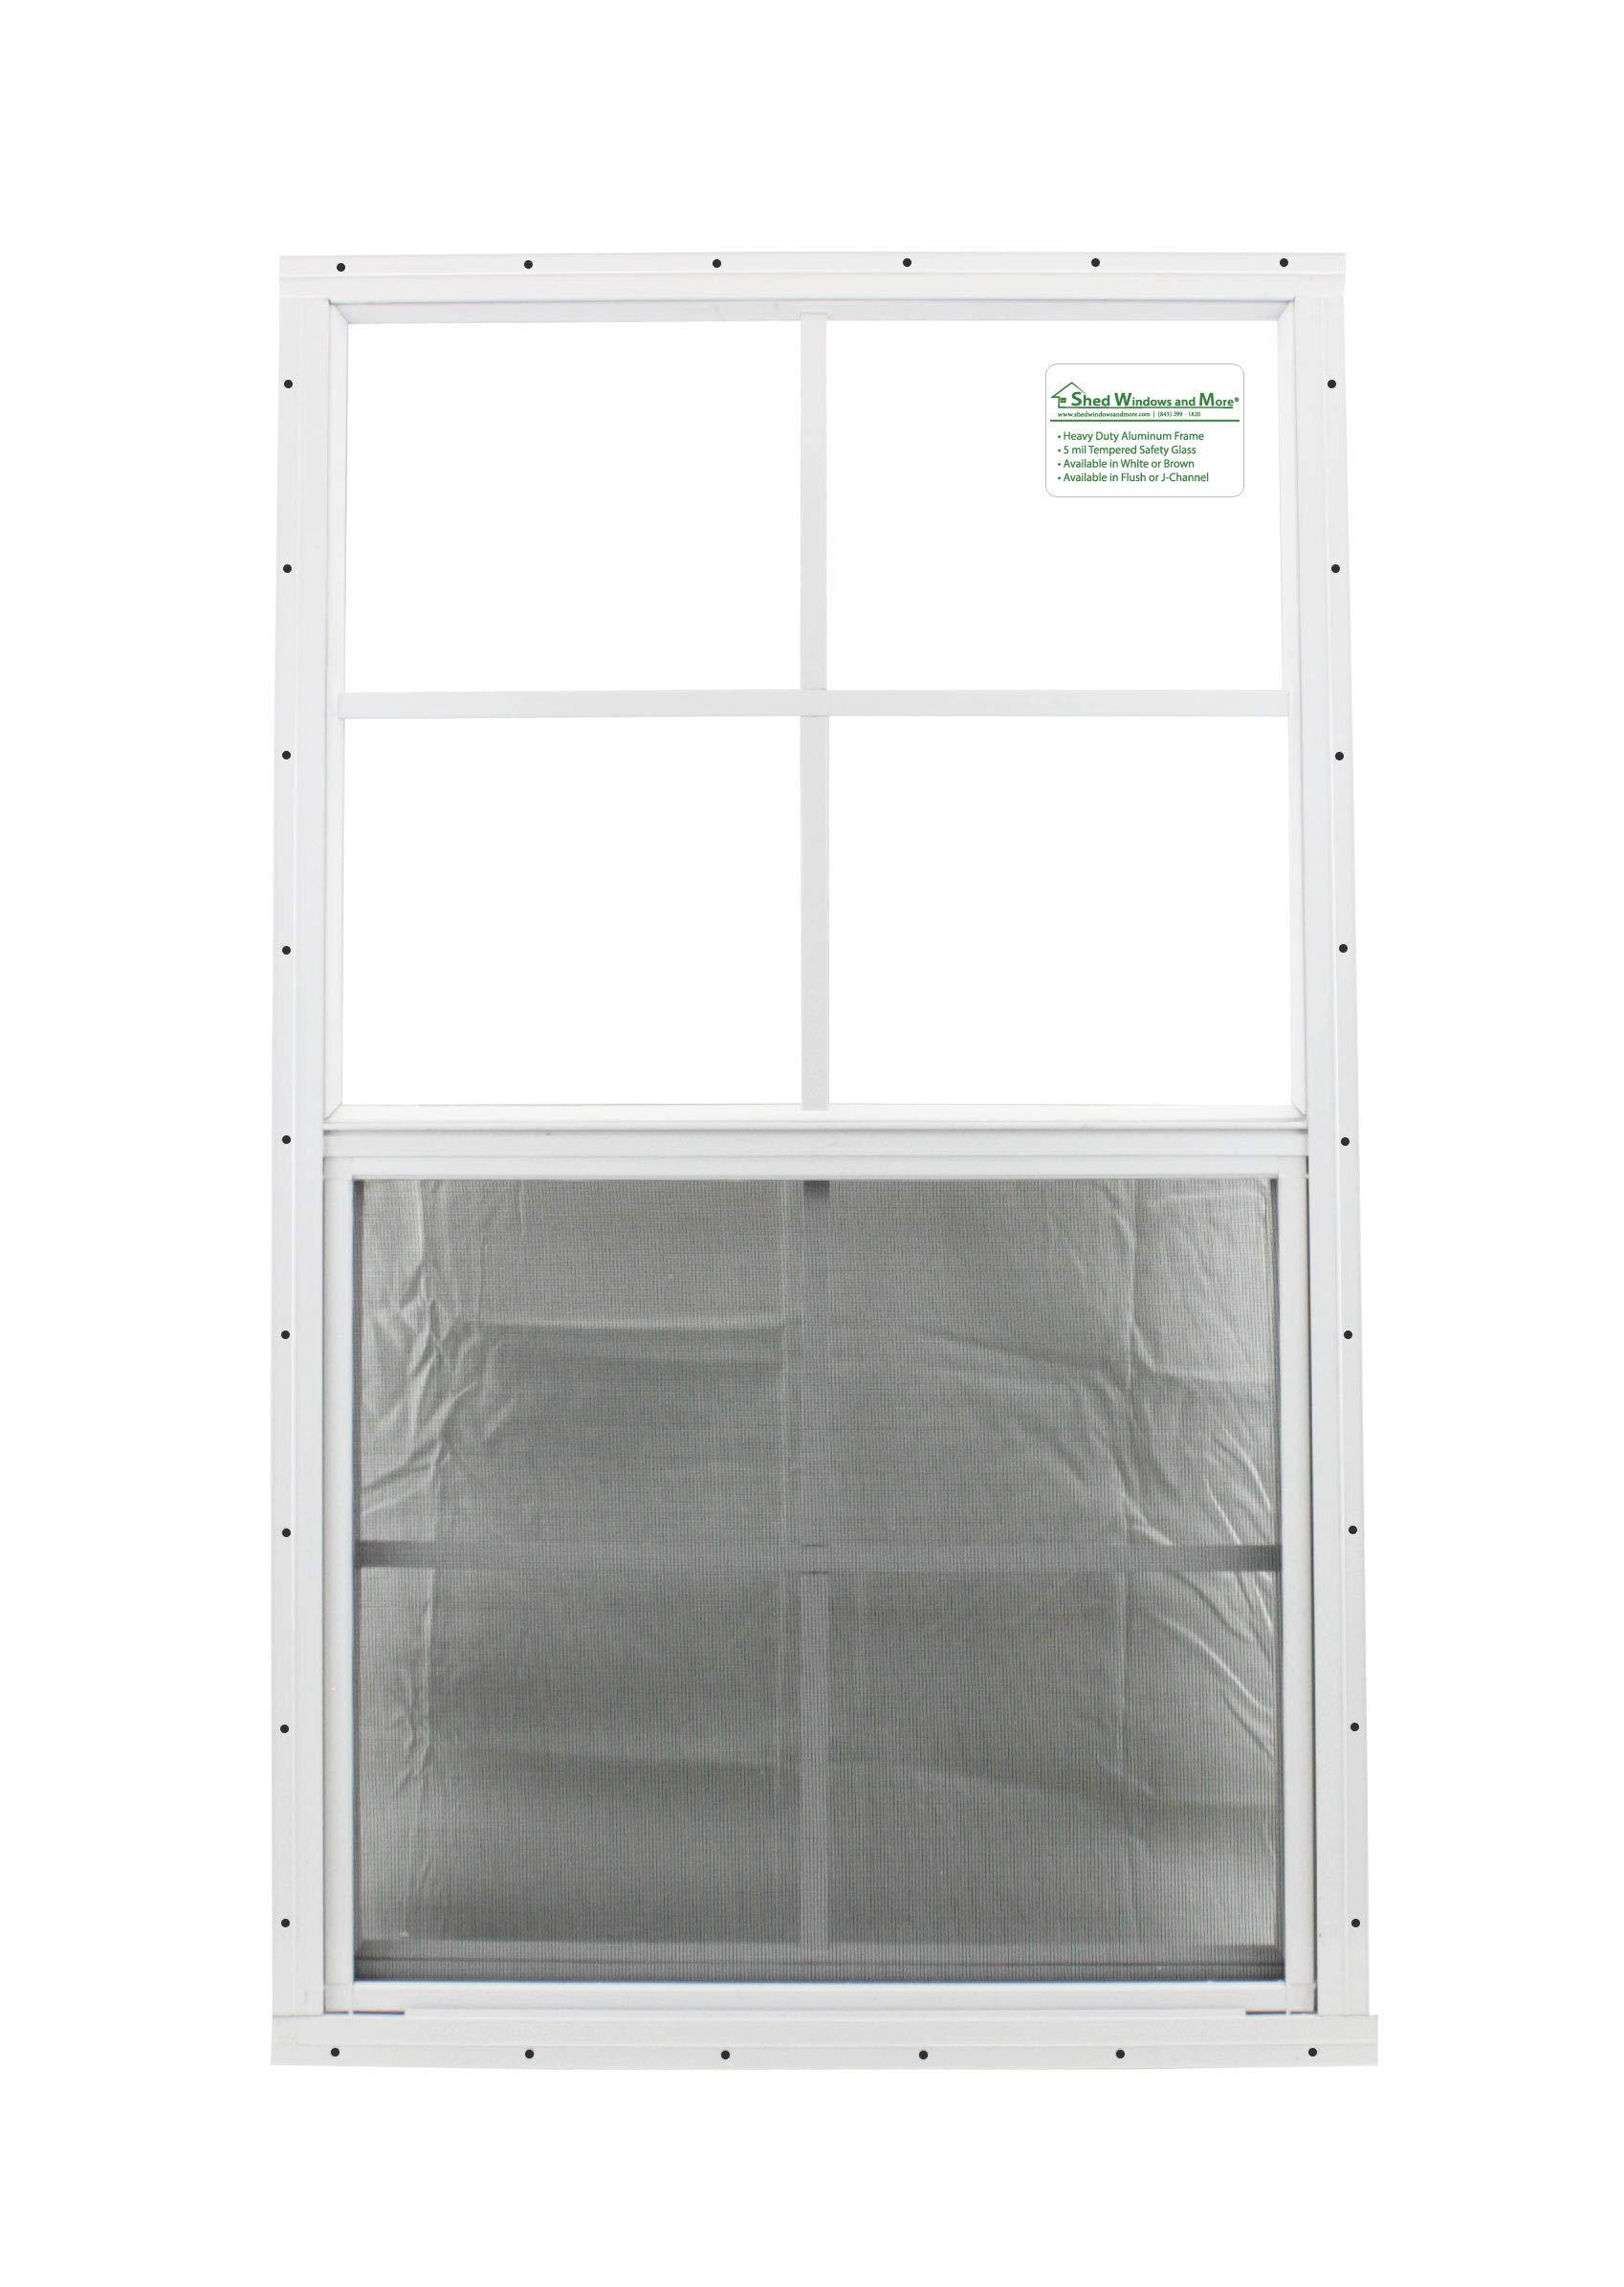 Shed Windows 24'' X 36'' White Flush Mount SAFETY/TEMPERED GLASS, Playhouse Windows, Chicken Coop Windows